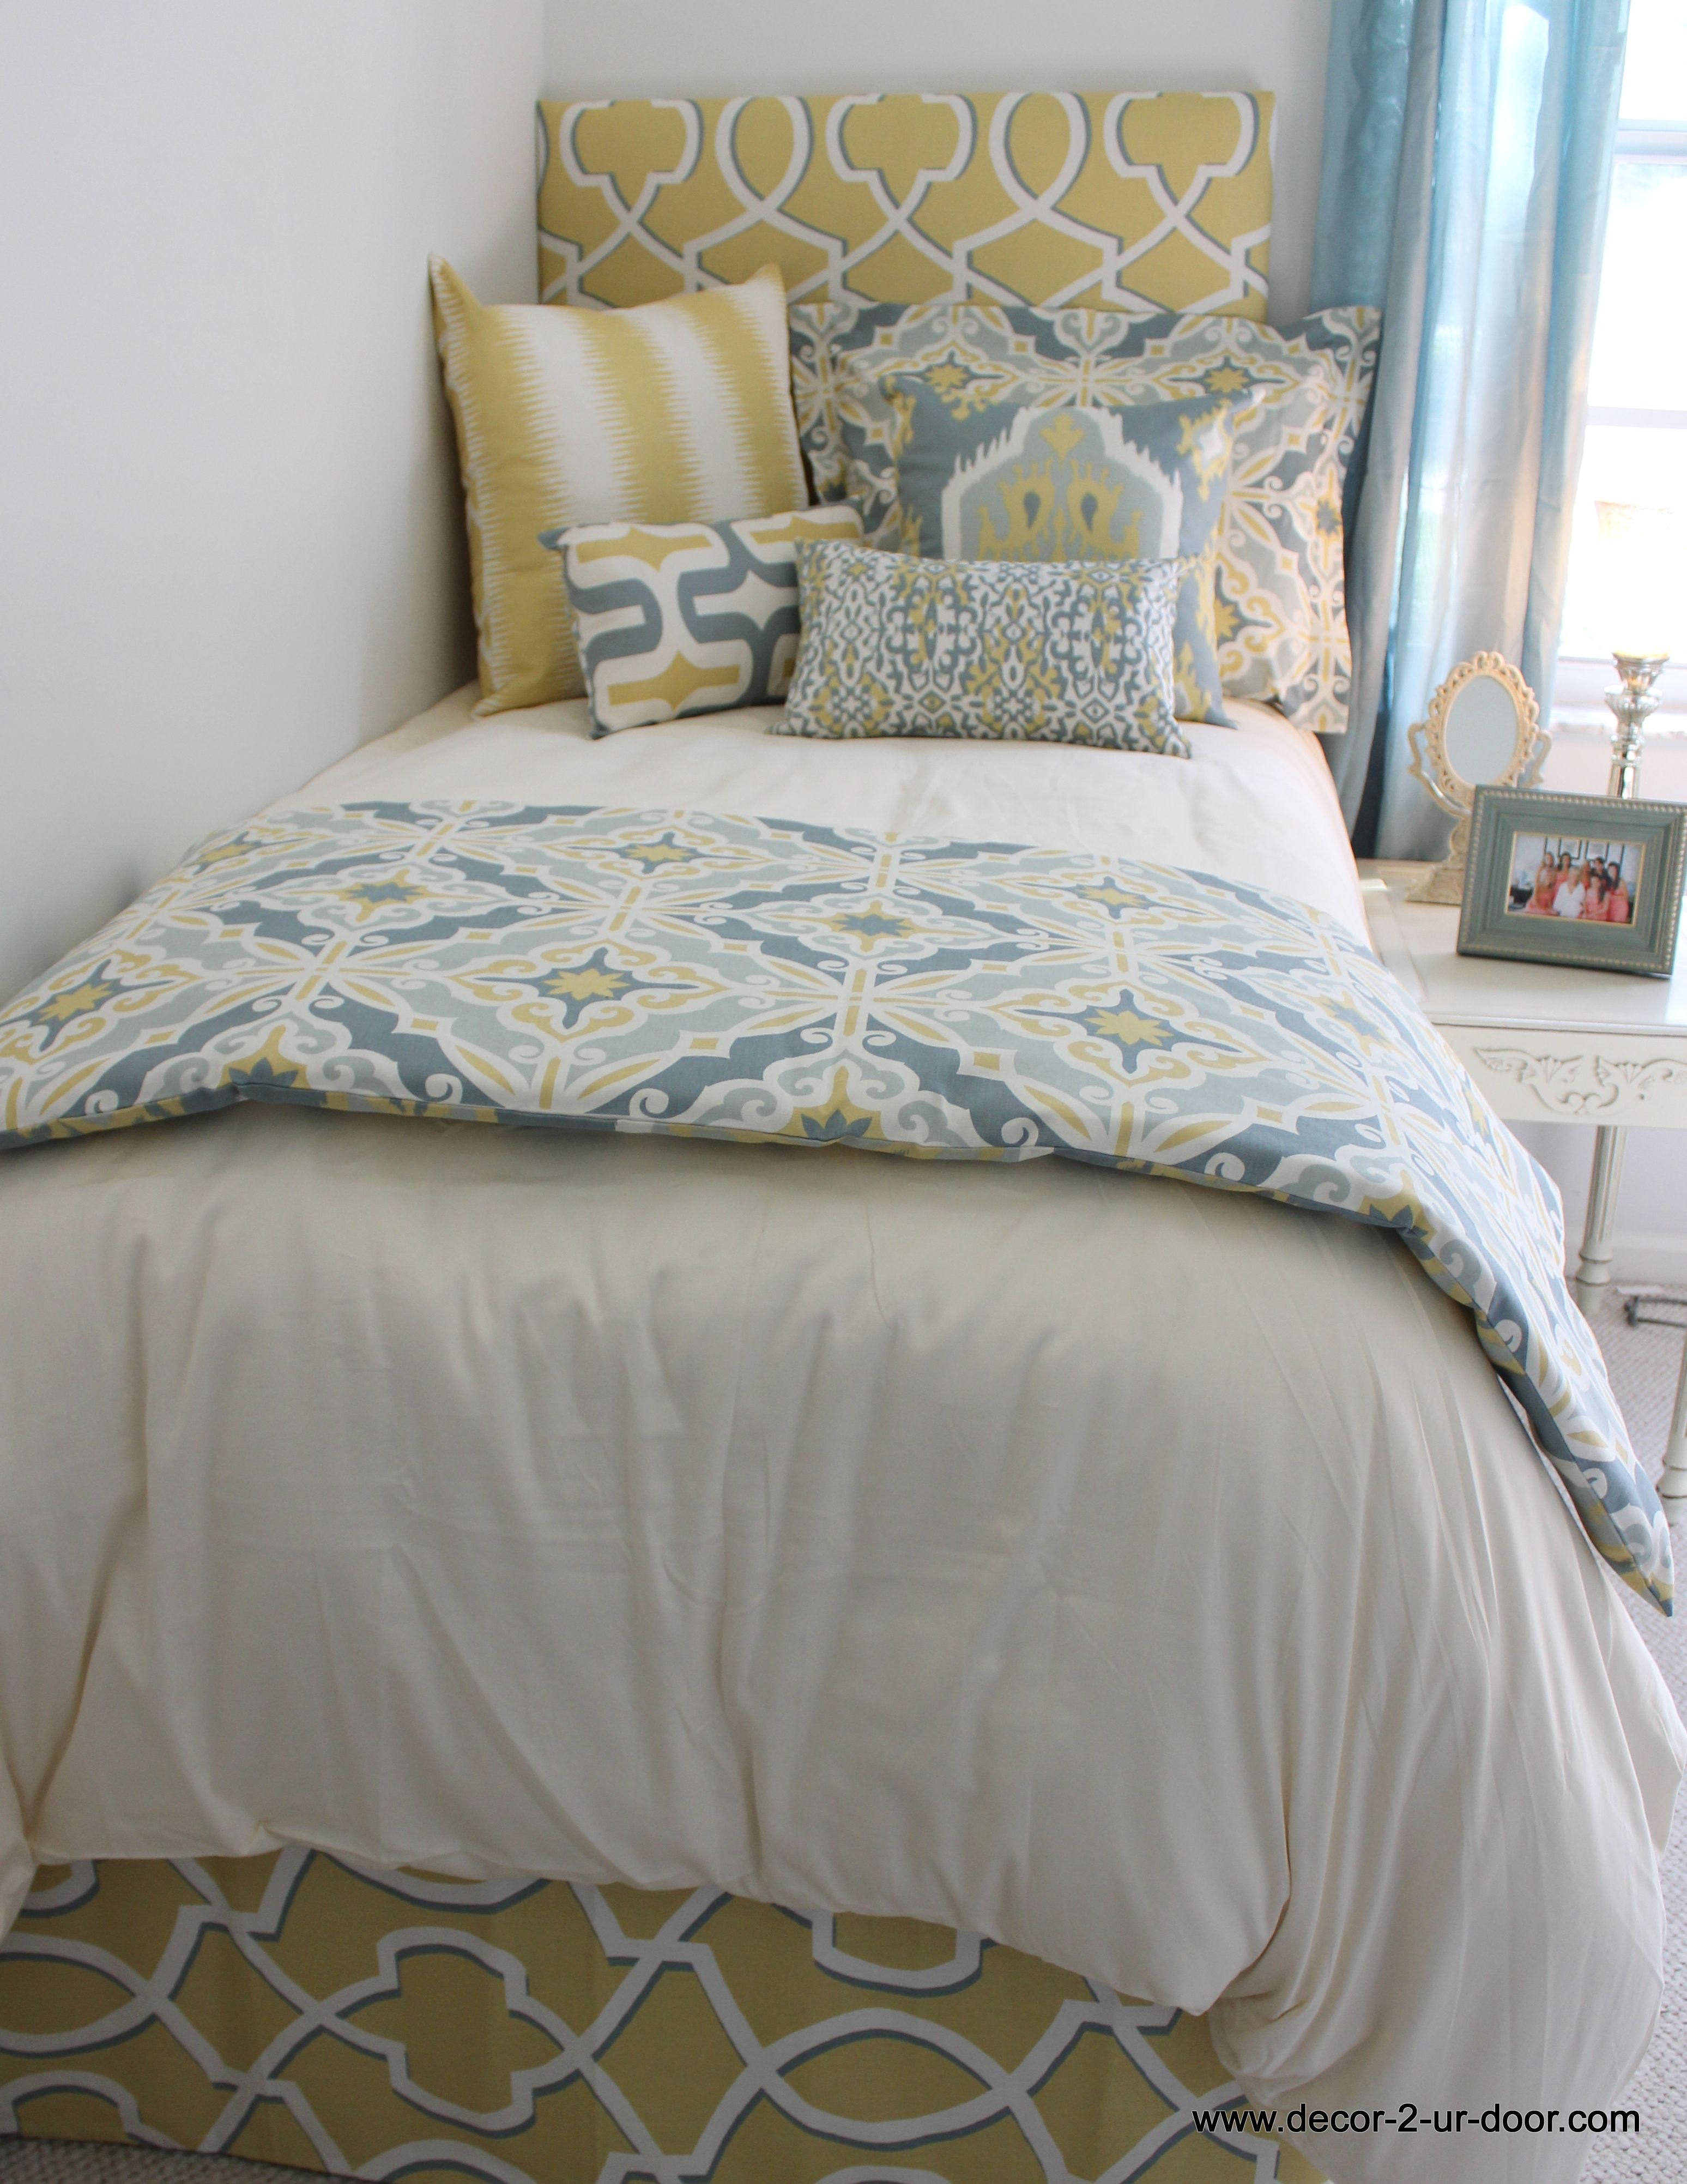 Decorating Ideas > Pin By Decor 2 Ur Door On 2014 Dorm Room Designs  Pinterest ~ 000548_Fancy Dorm Room Ideas